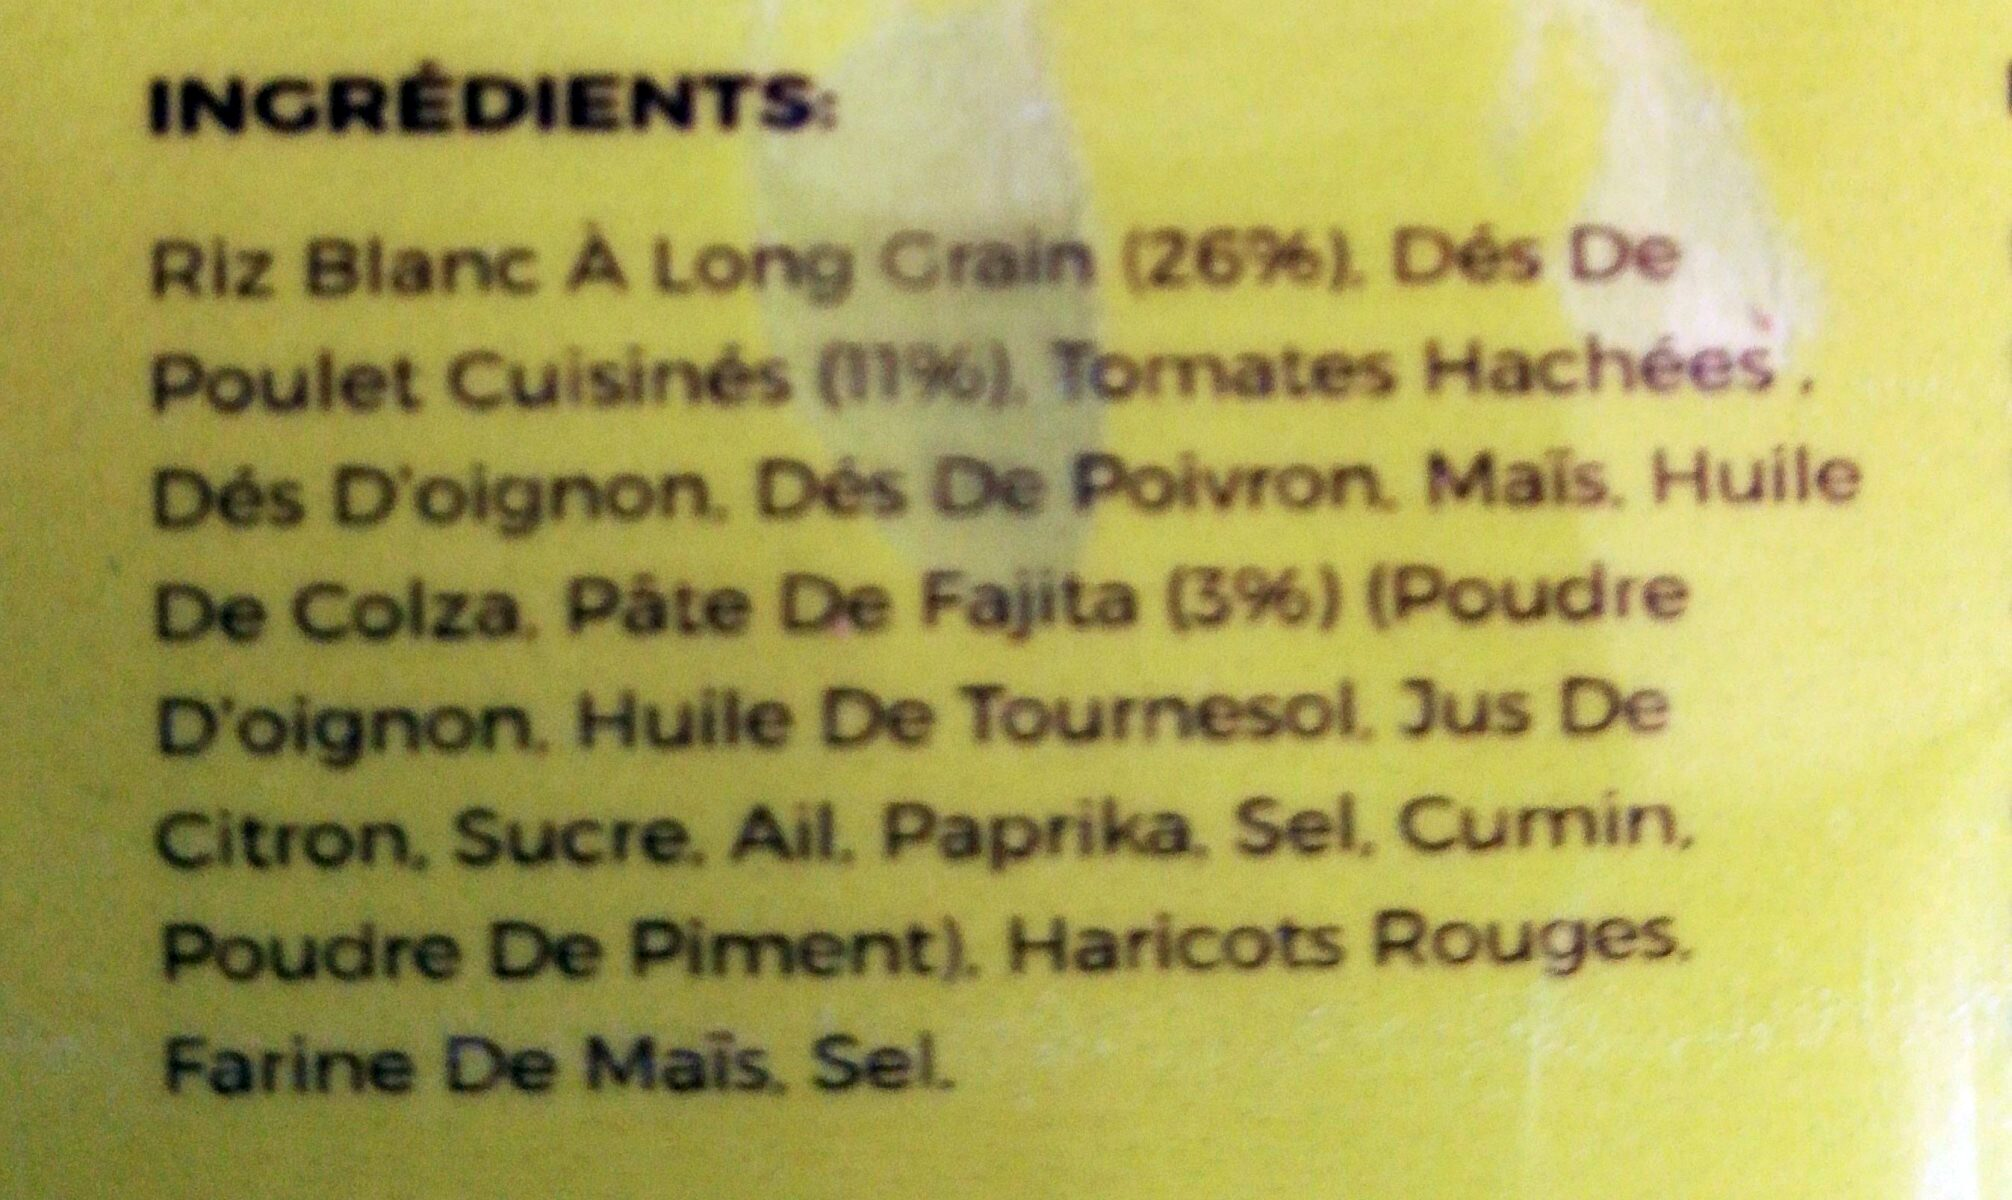 Chicken fajita with rice - Ingredients